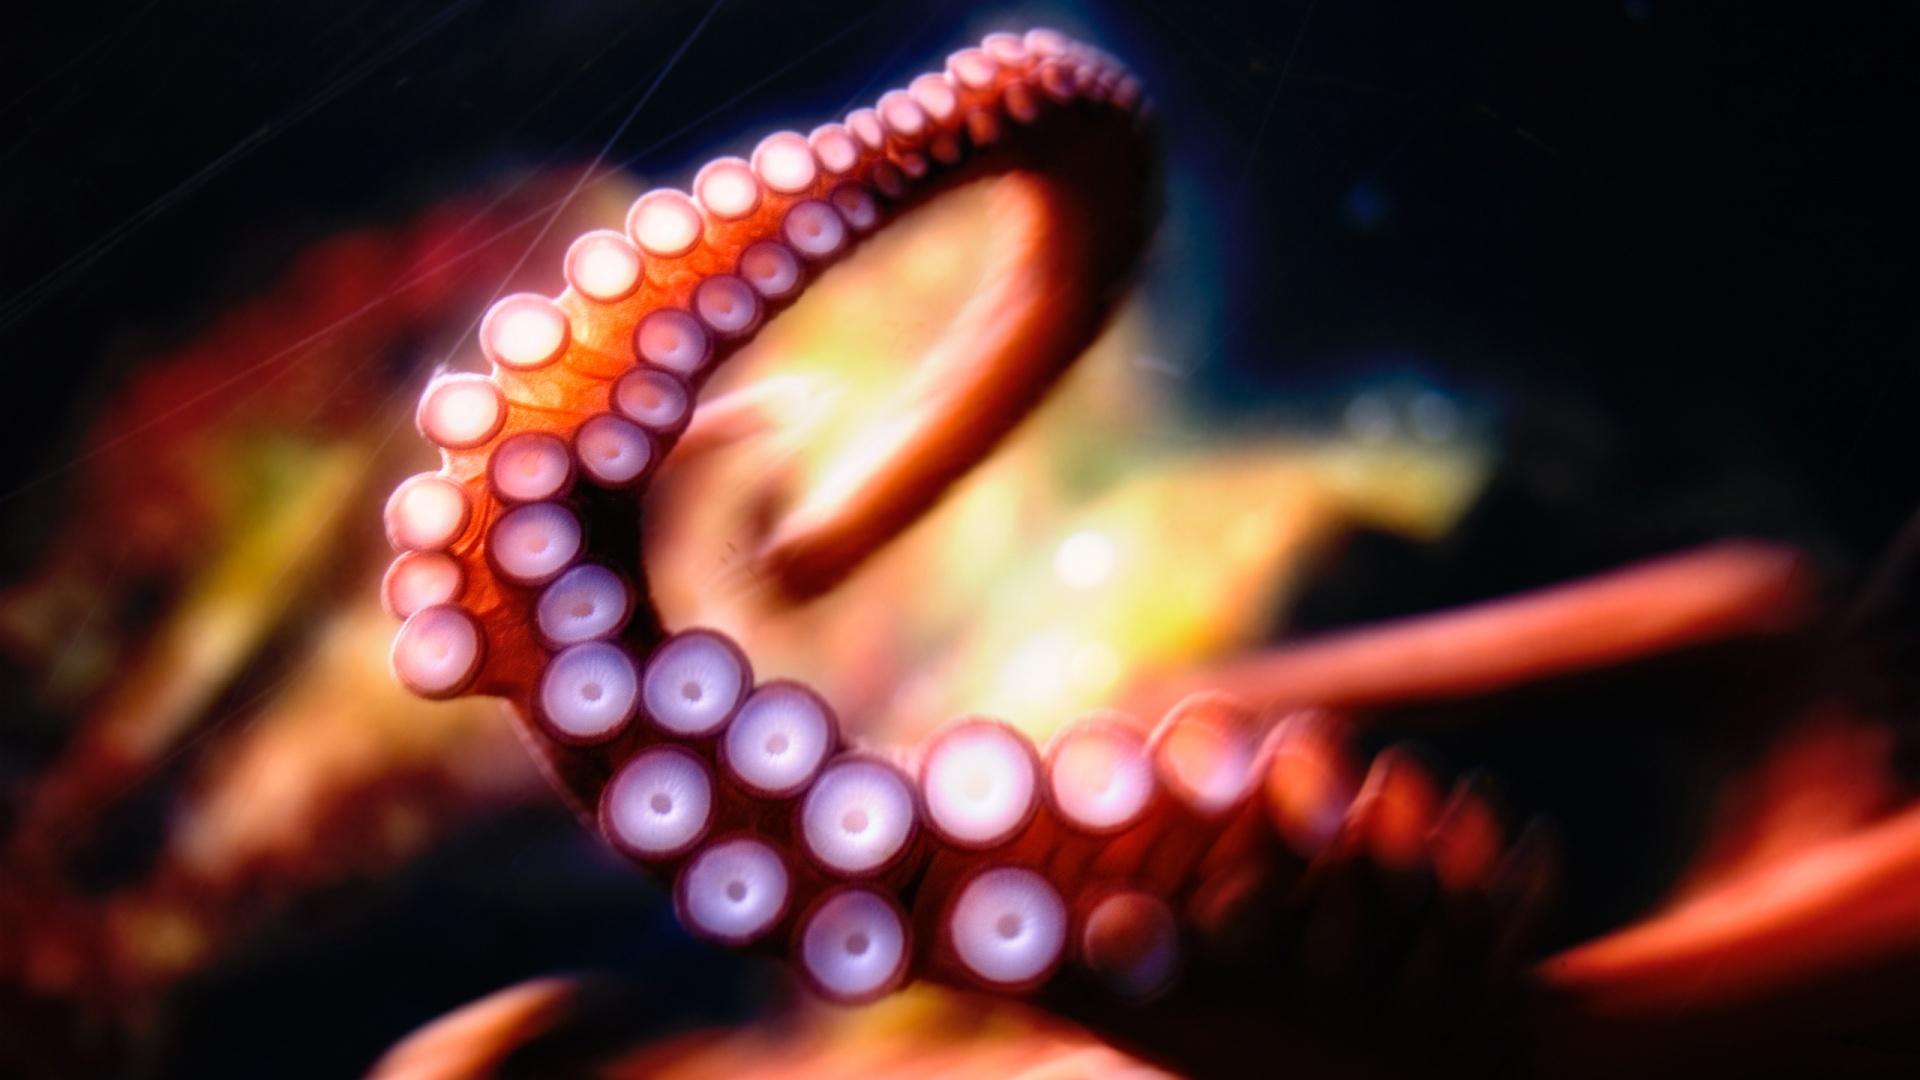 Fall Halloween Desktop Wallpaper Hd Octopus Wallpapers Pixelstalk Net